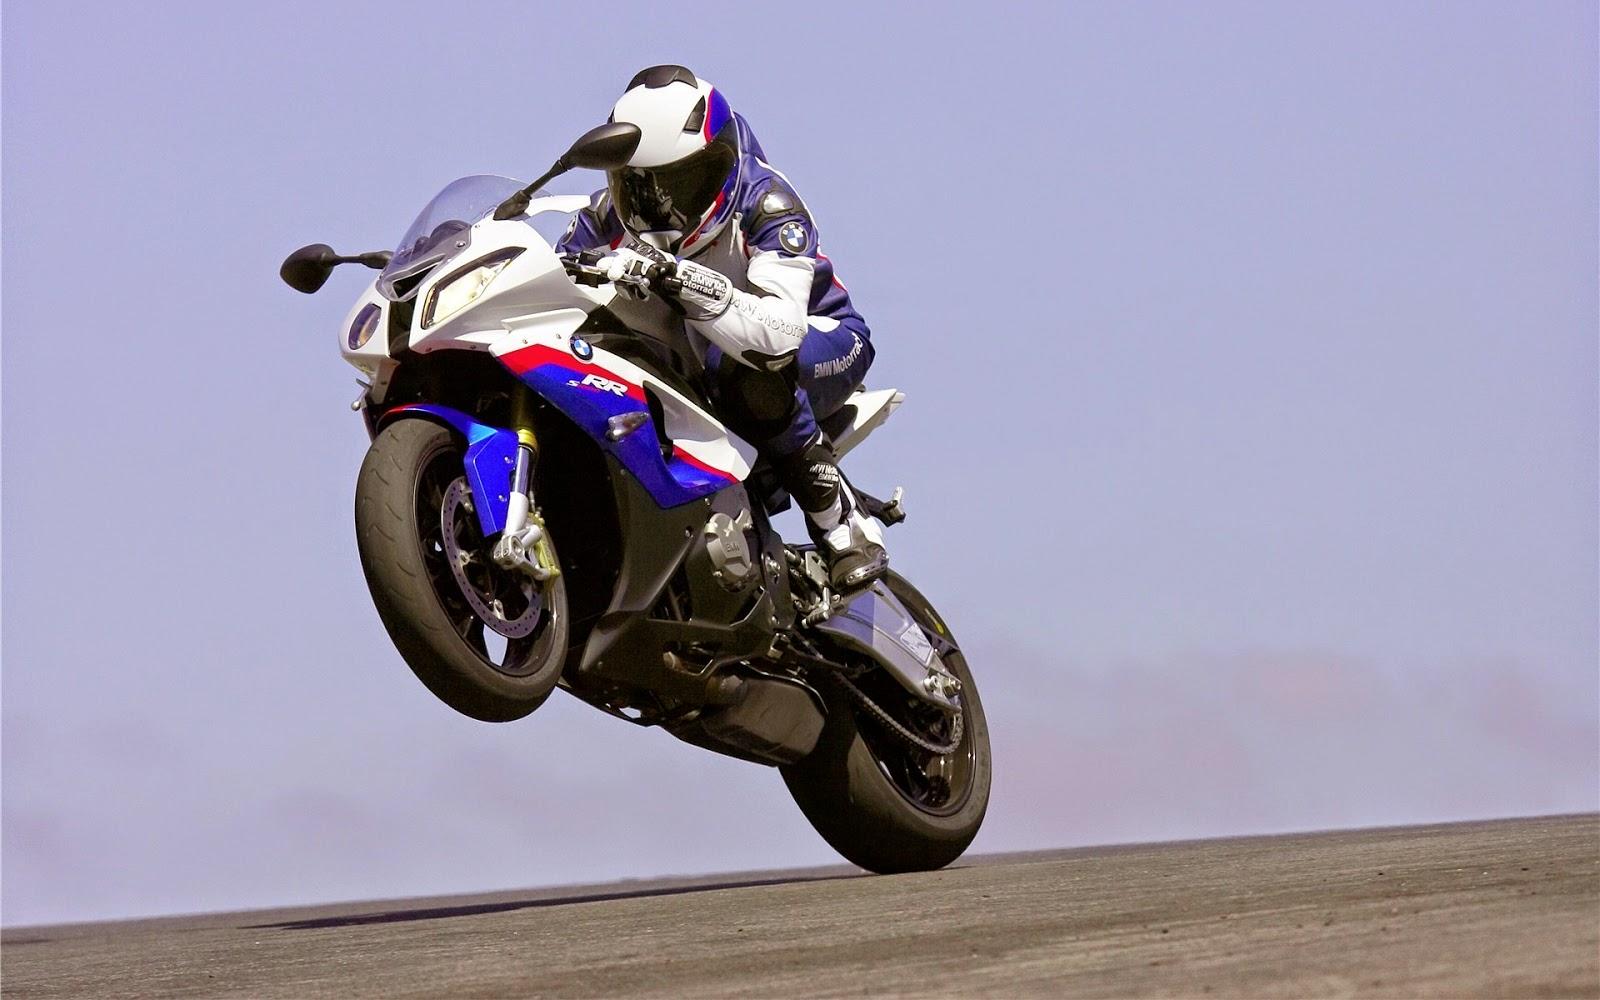 Full HD wallpaper - Superbike Wallpapers